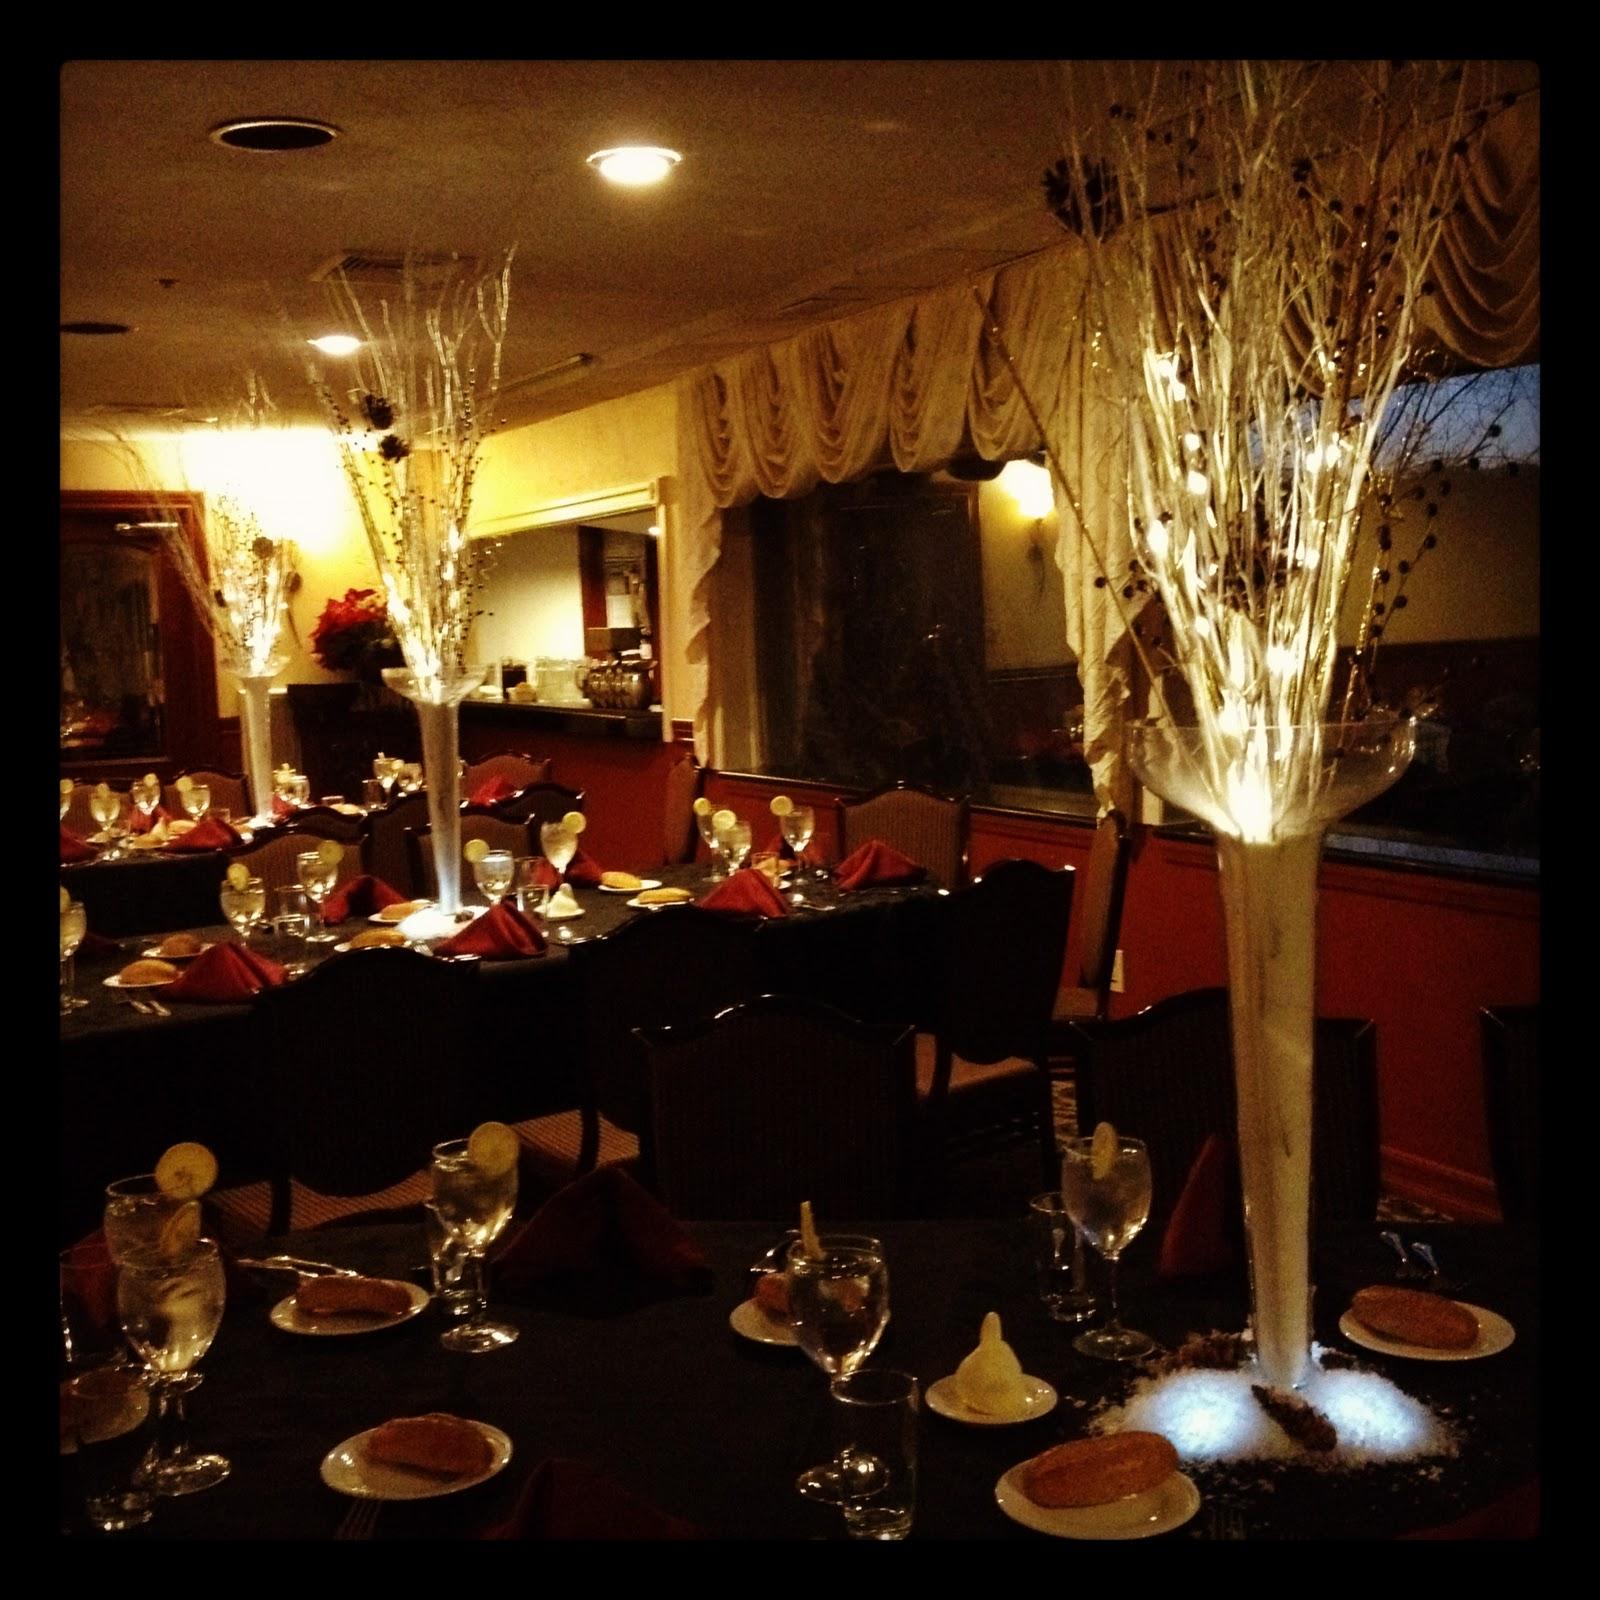 Burgundy And Gold Wedding Decorations: Centerpieces Sans Flowers